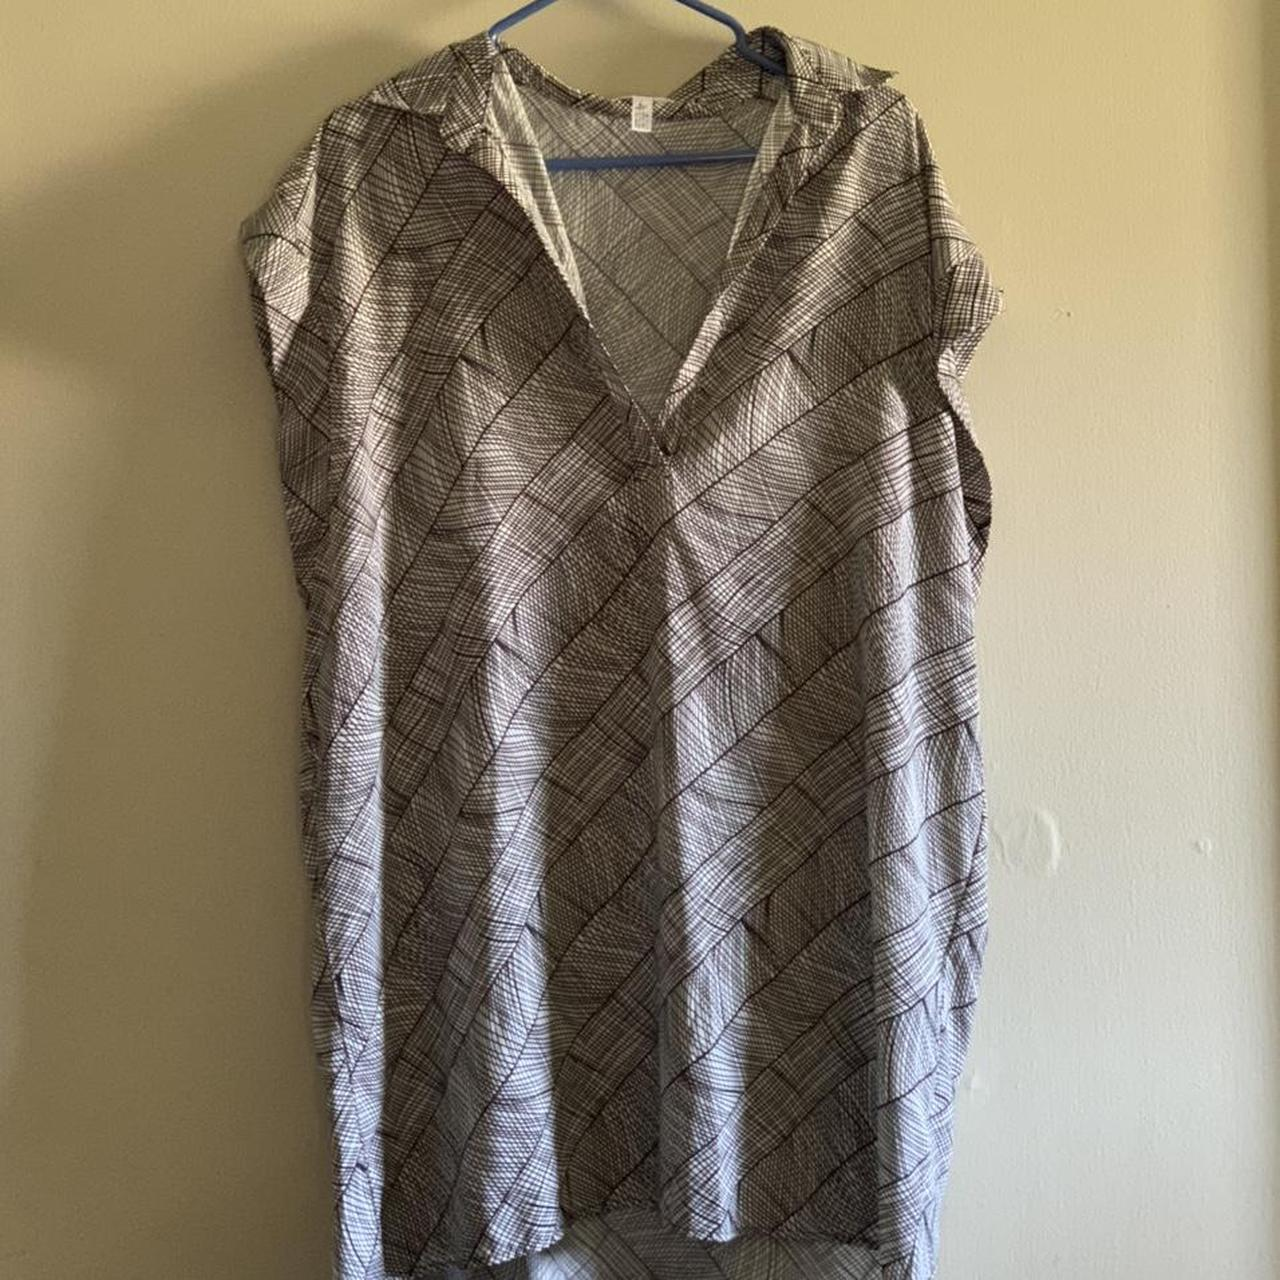 Product Image 1 - super funky lightweight shift dress,